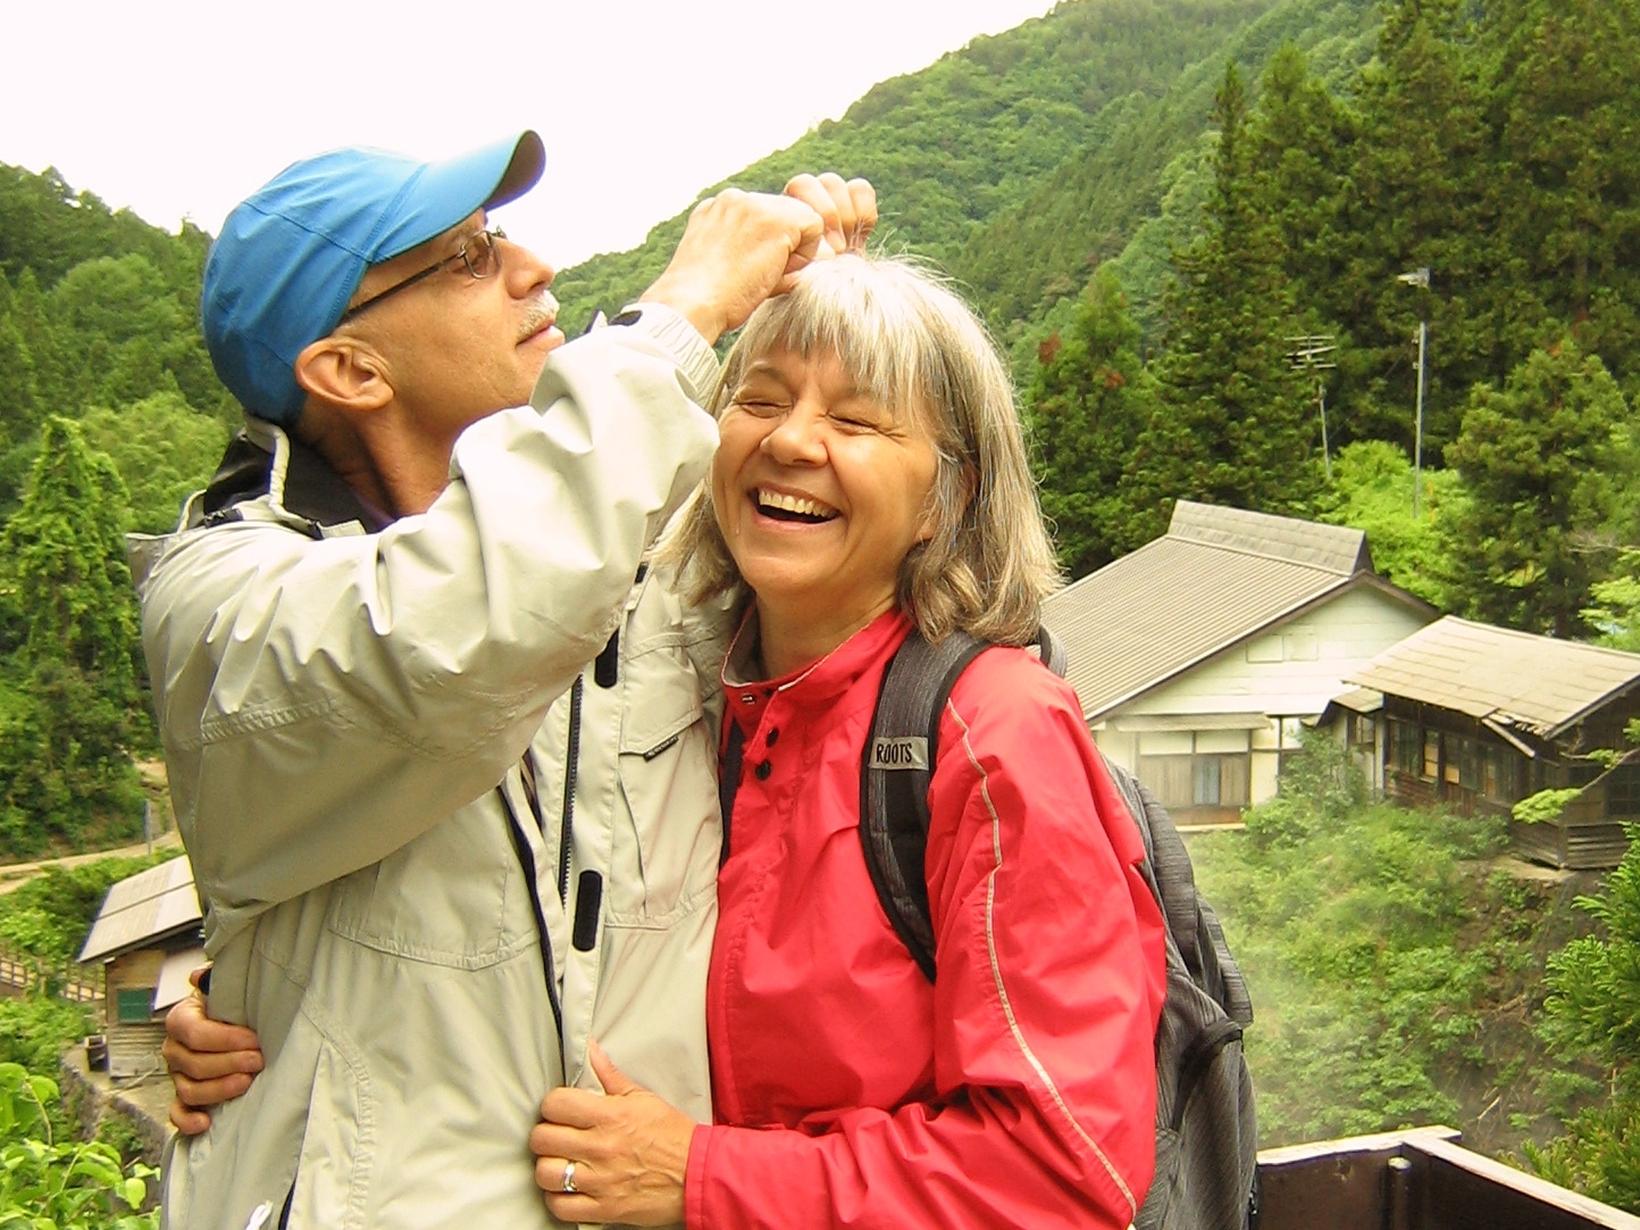 Sandra & John from Victoria, British Columbia, Canada